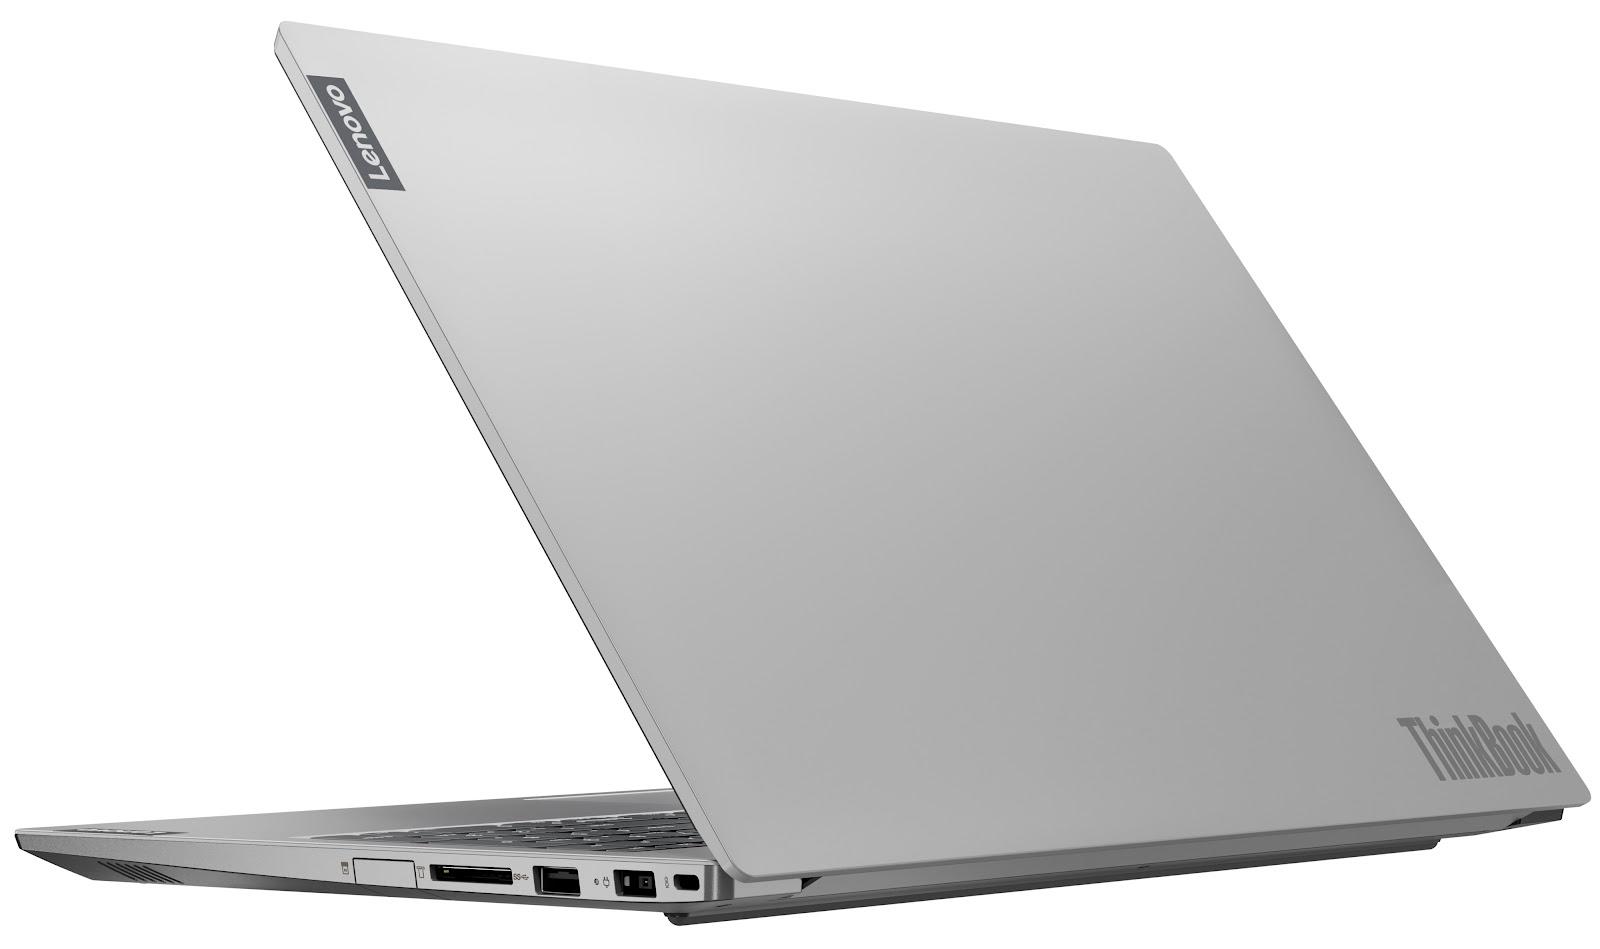 Фото 1. Ноутбук Lenovo ThinkBook 15-IIL (20SM0081RU)